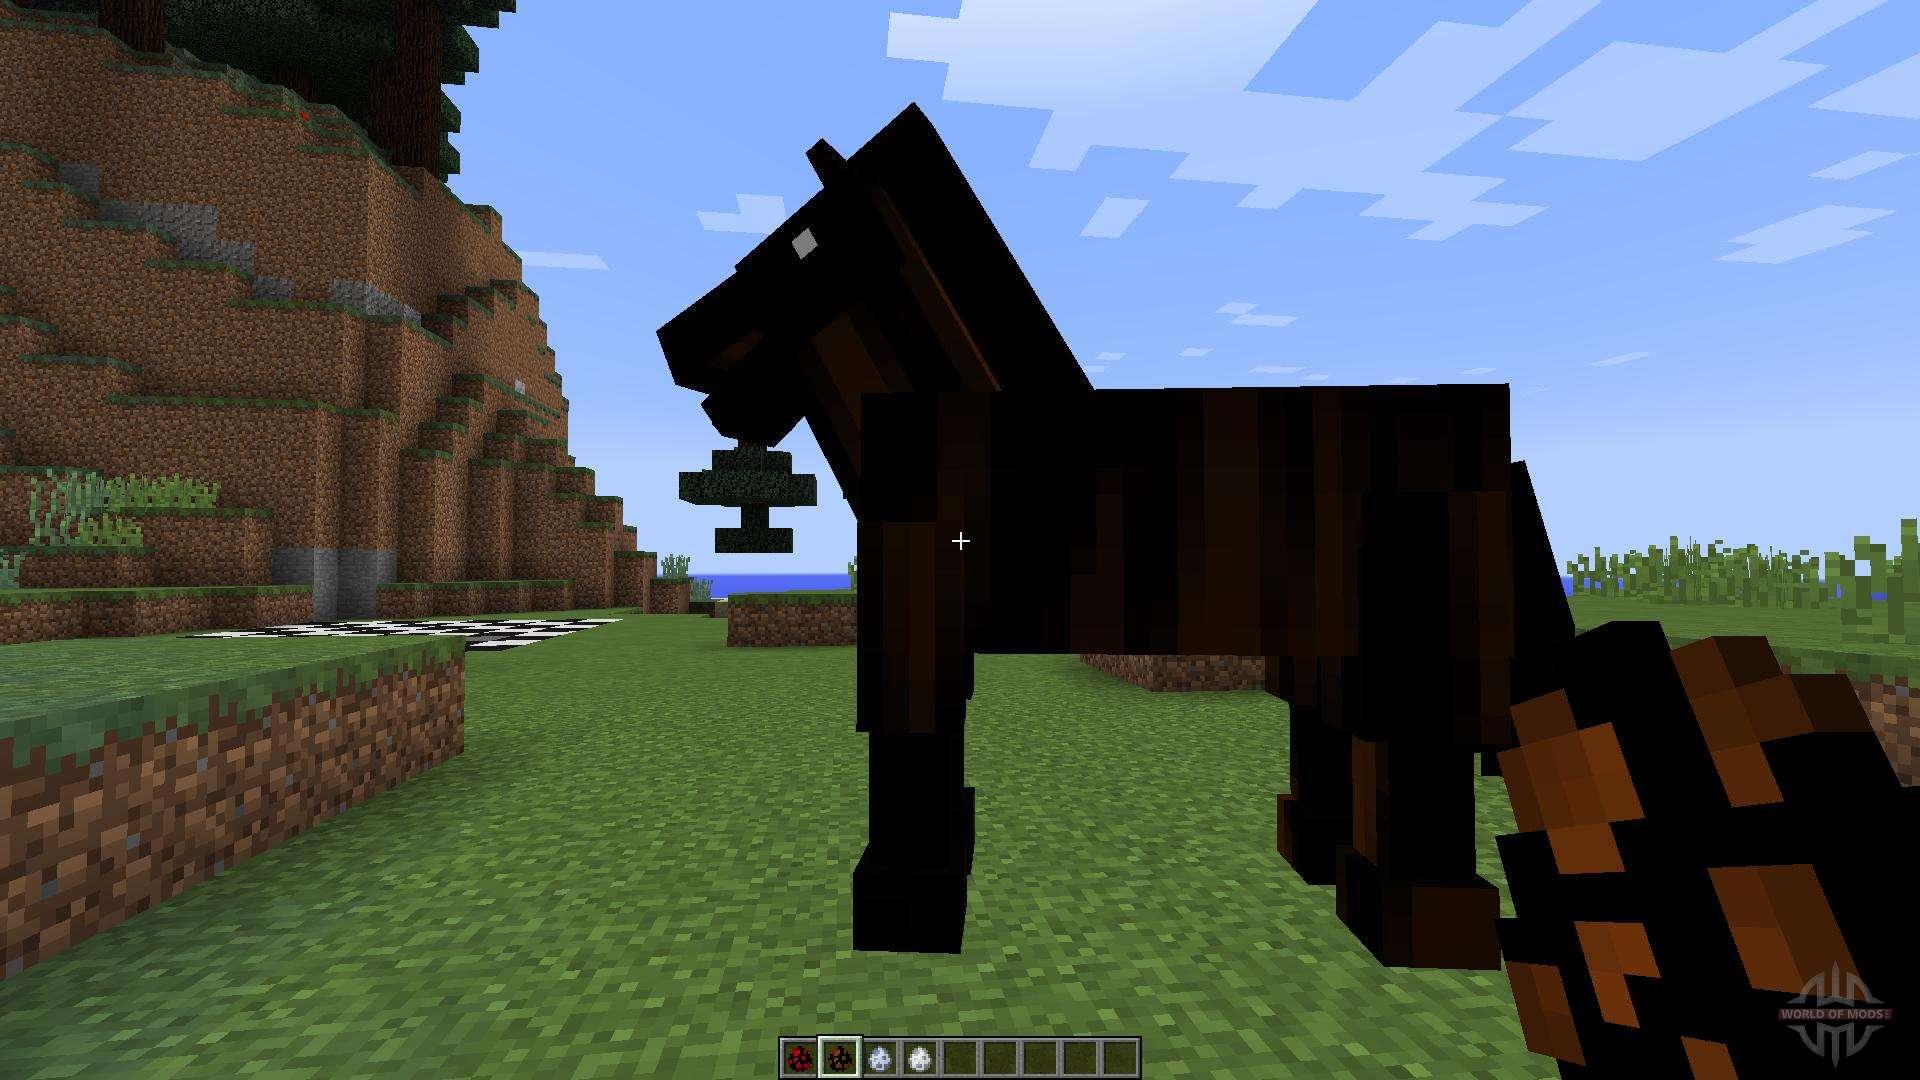 Ultimate Unicorn [1 8] for Minecraft